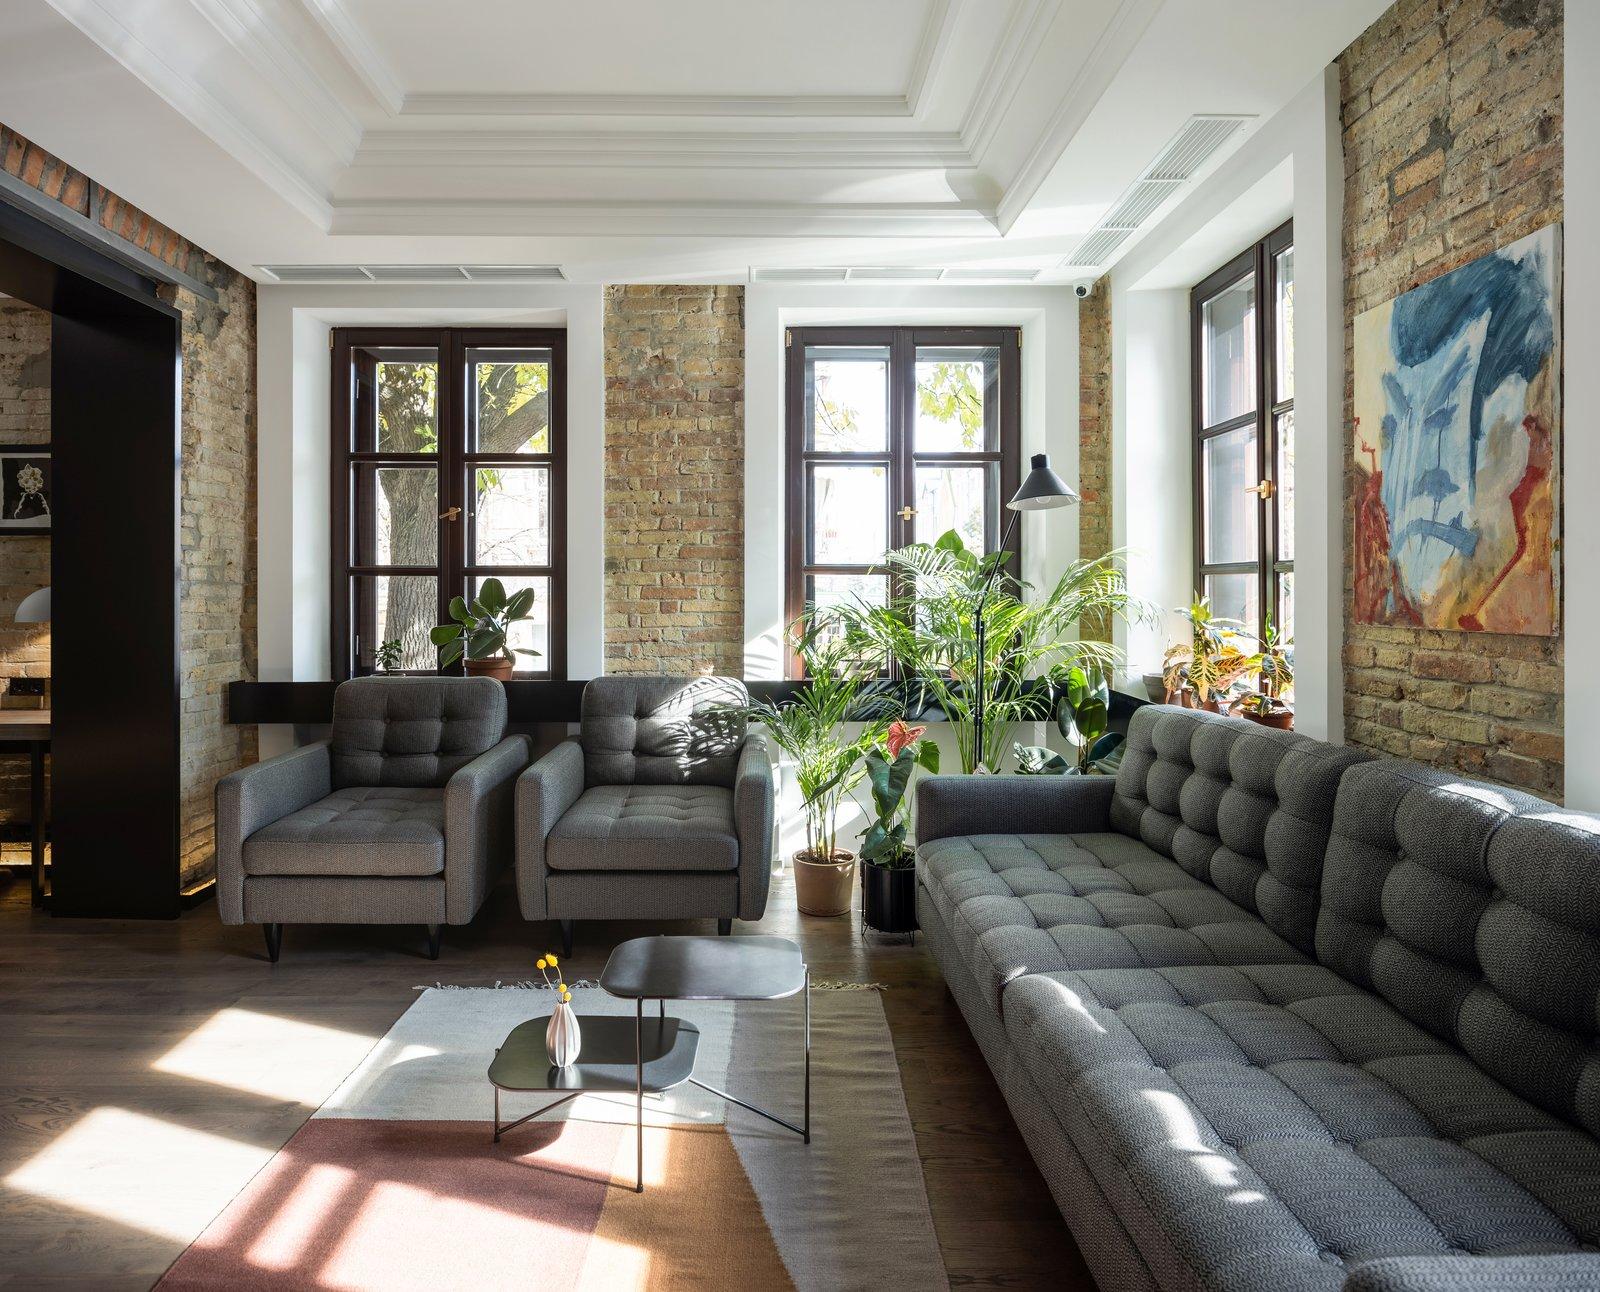 Bursa Hotel lounge area